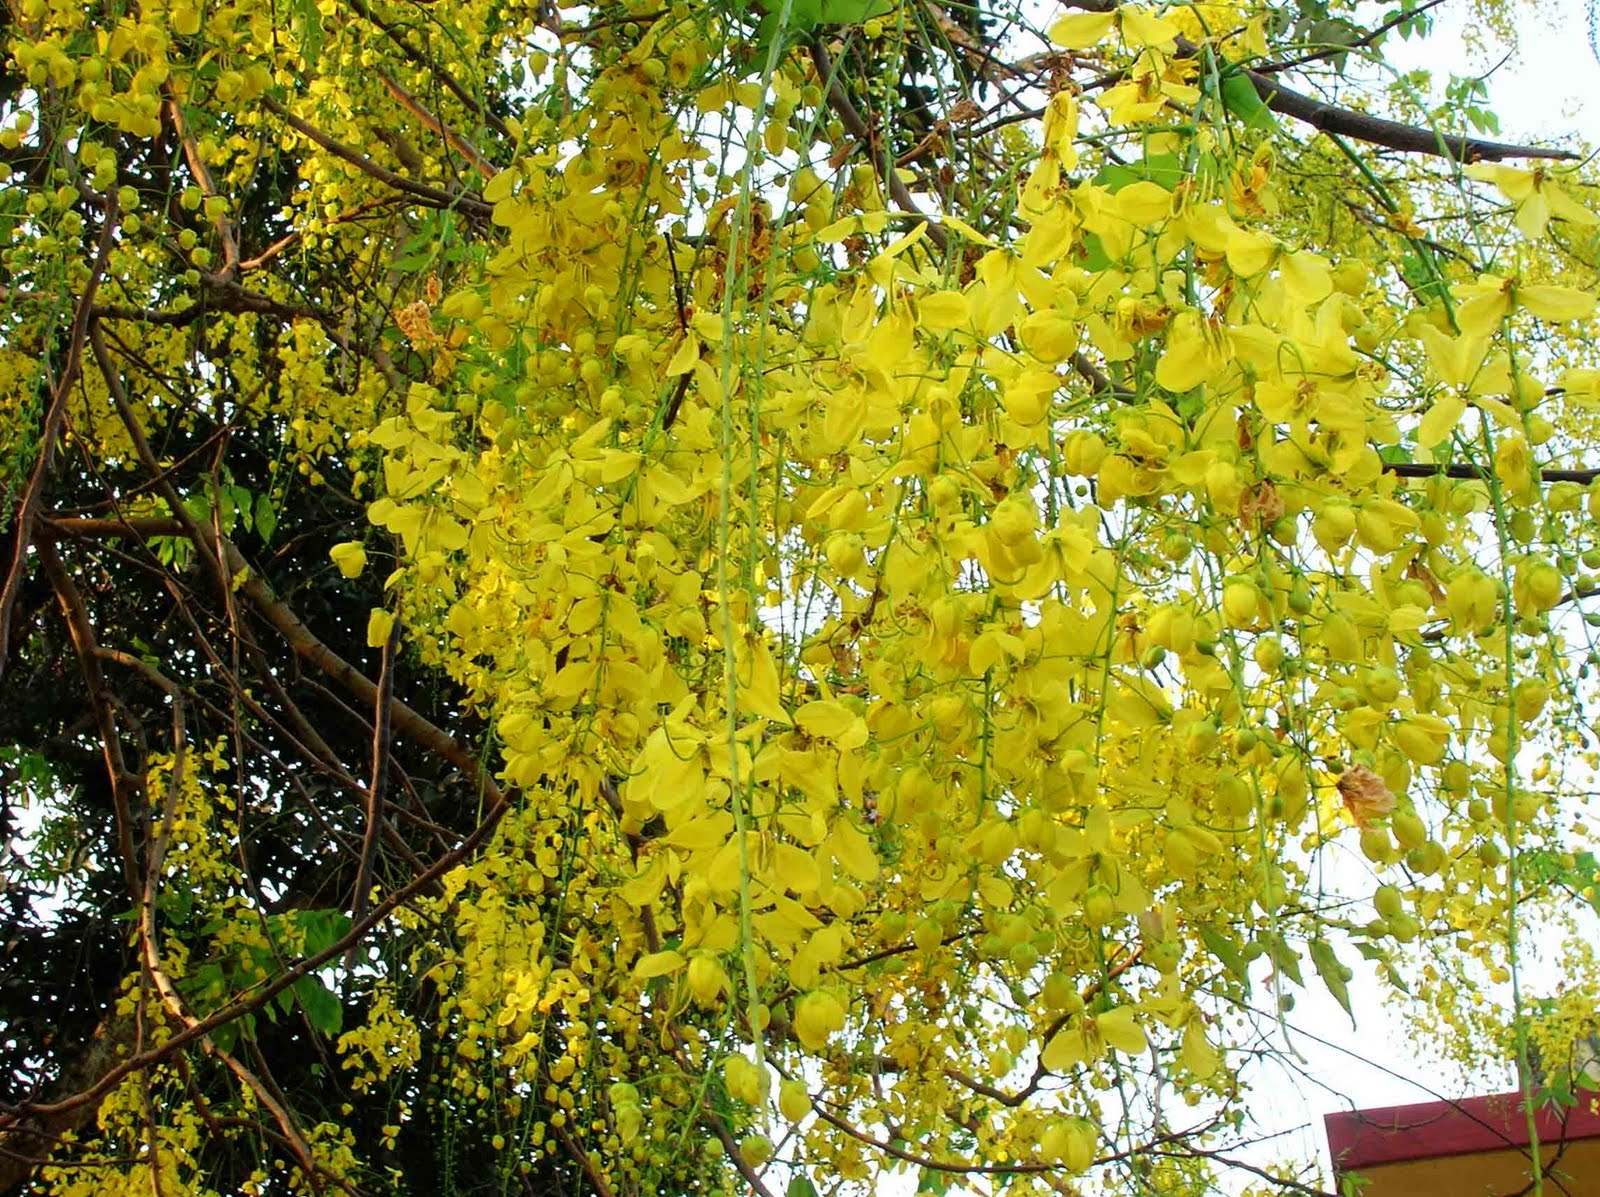 The urban gardener summer sherbet mumbai 39 s flowering trees for Garden trees with yellow flowers